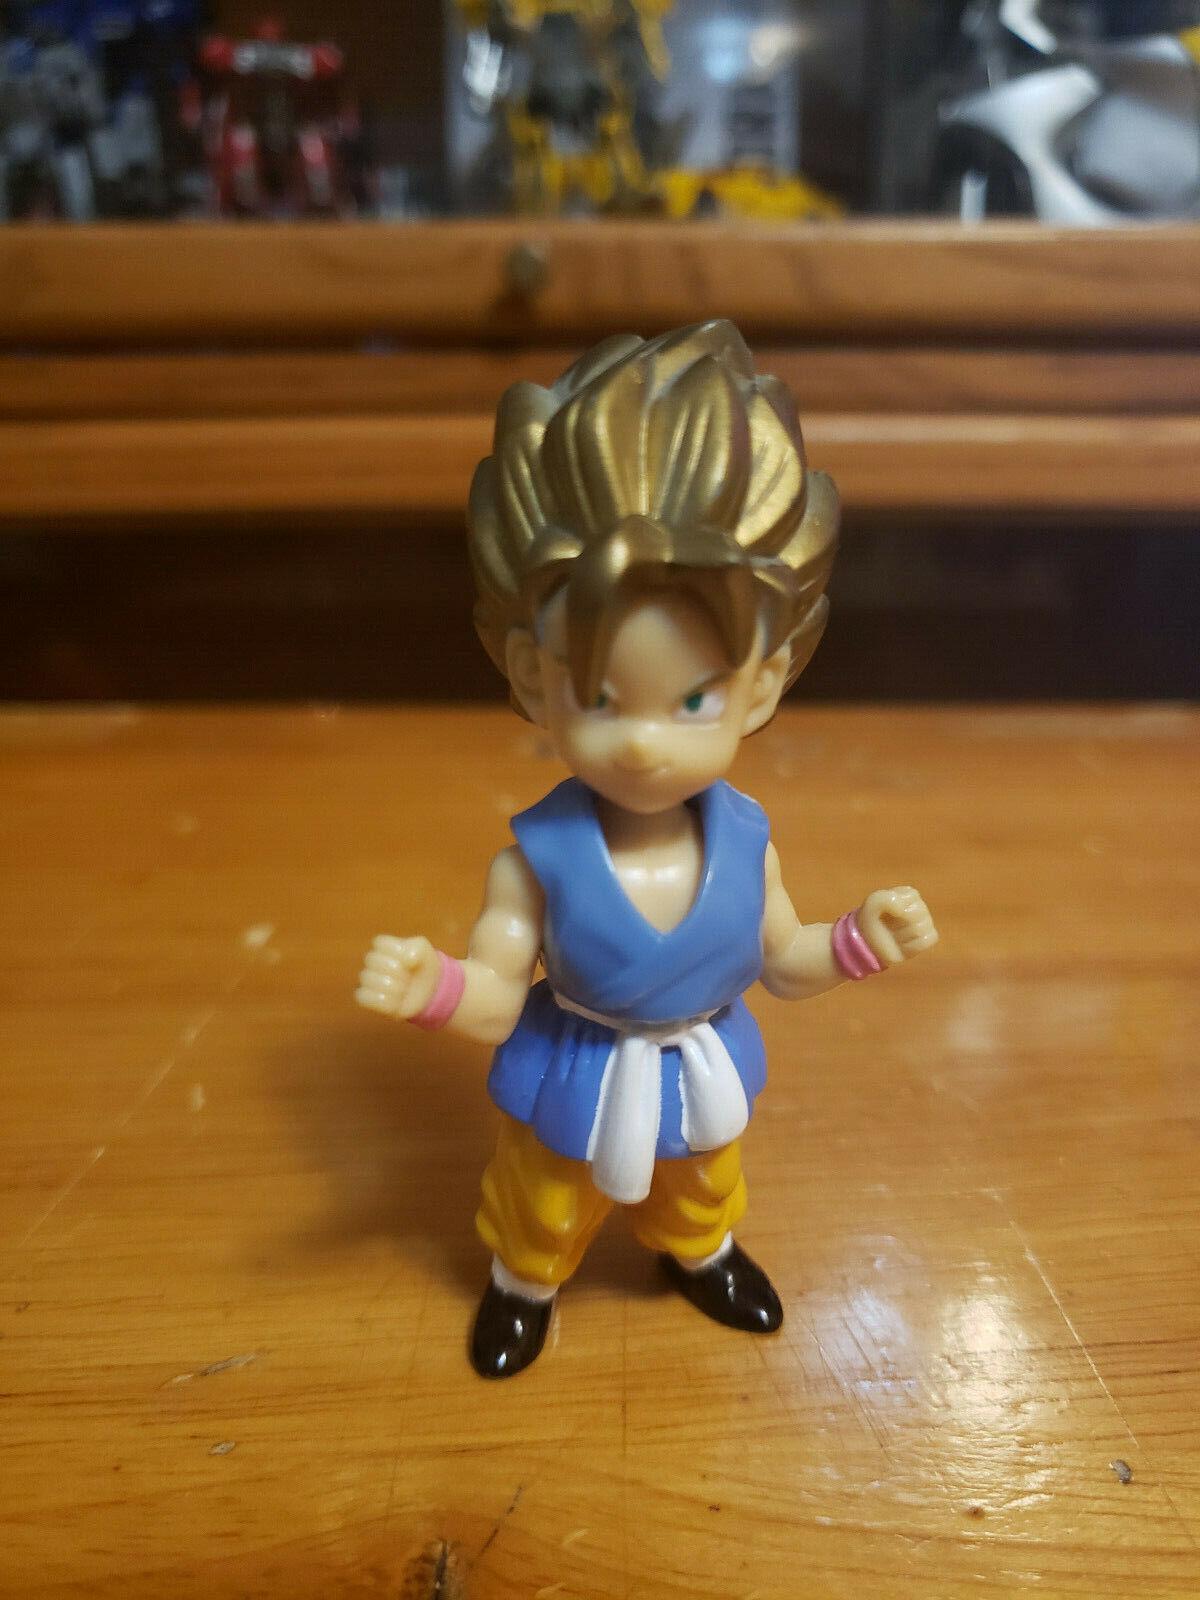 Character:GT Super Saiyan Kid Goku Vol 30:BANDAI Dragonball Z  and Dragon Ball GT super battle collection AB Toys & Irwin